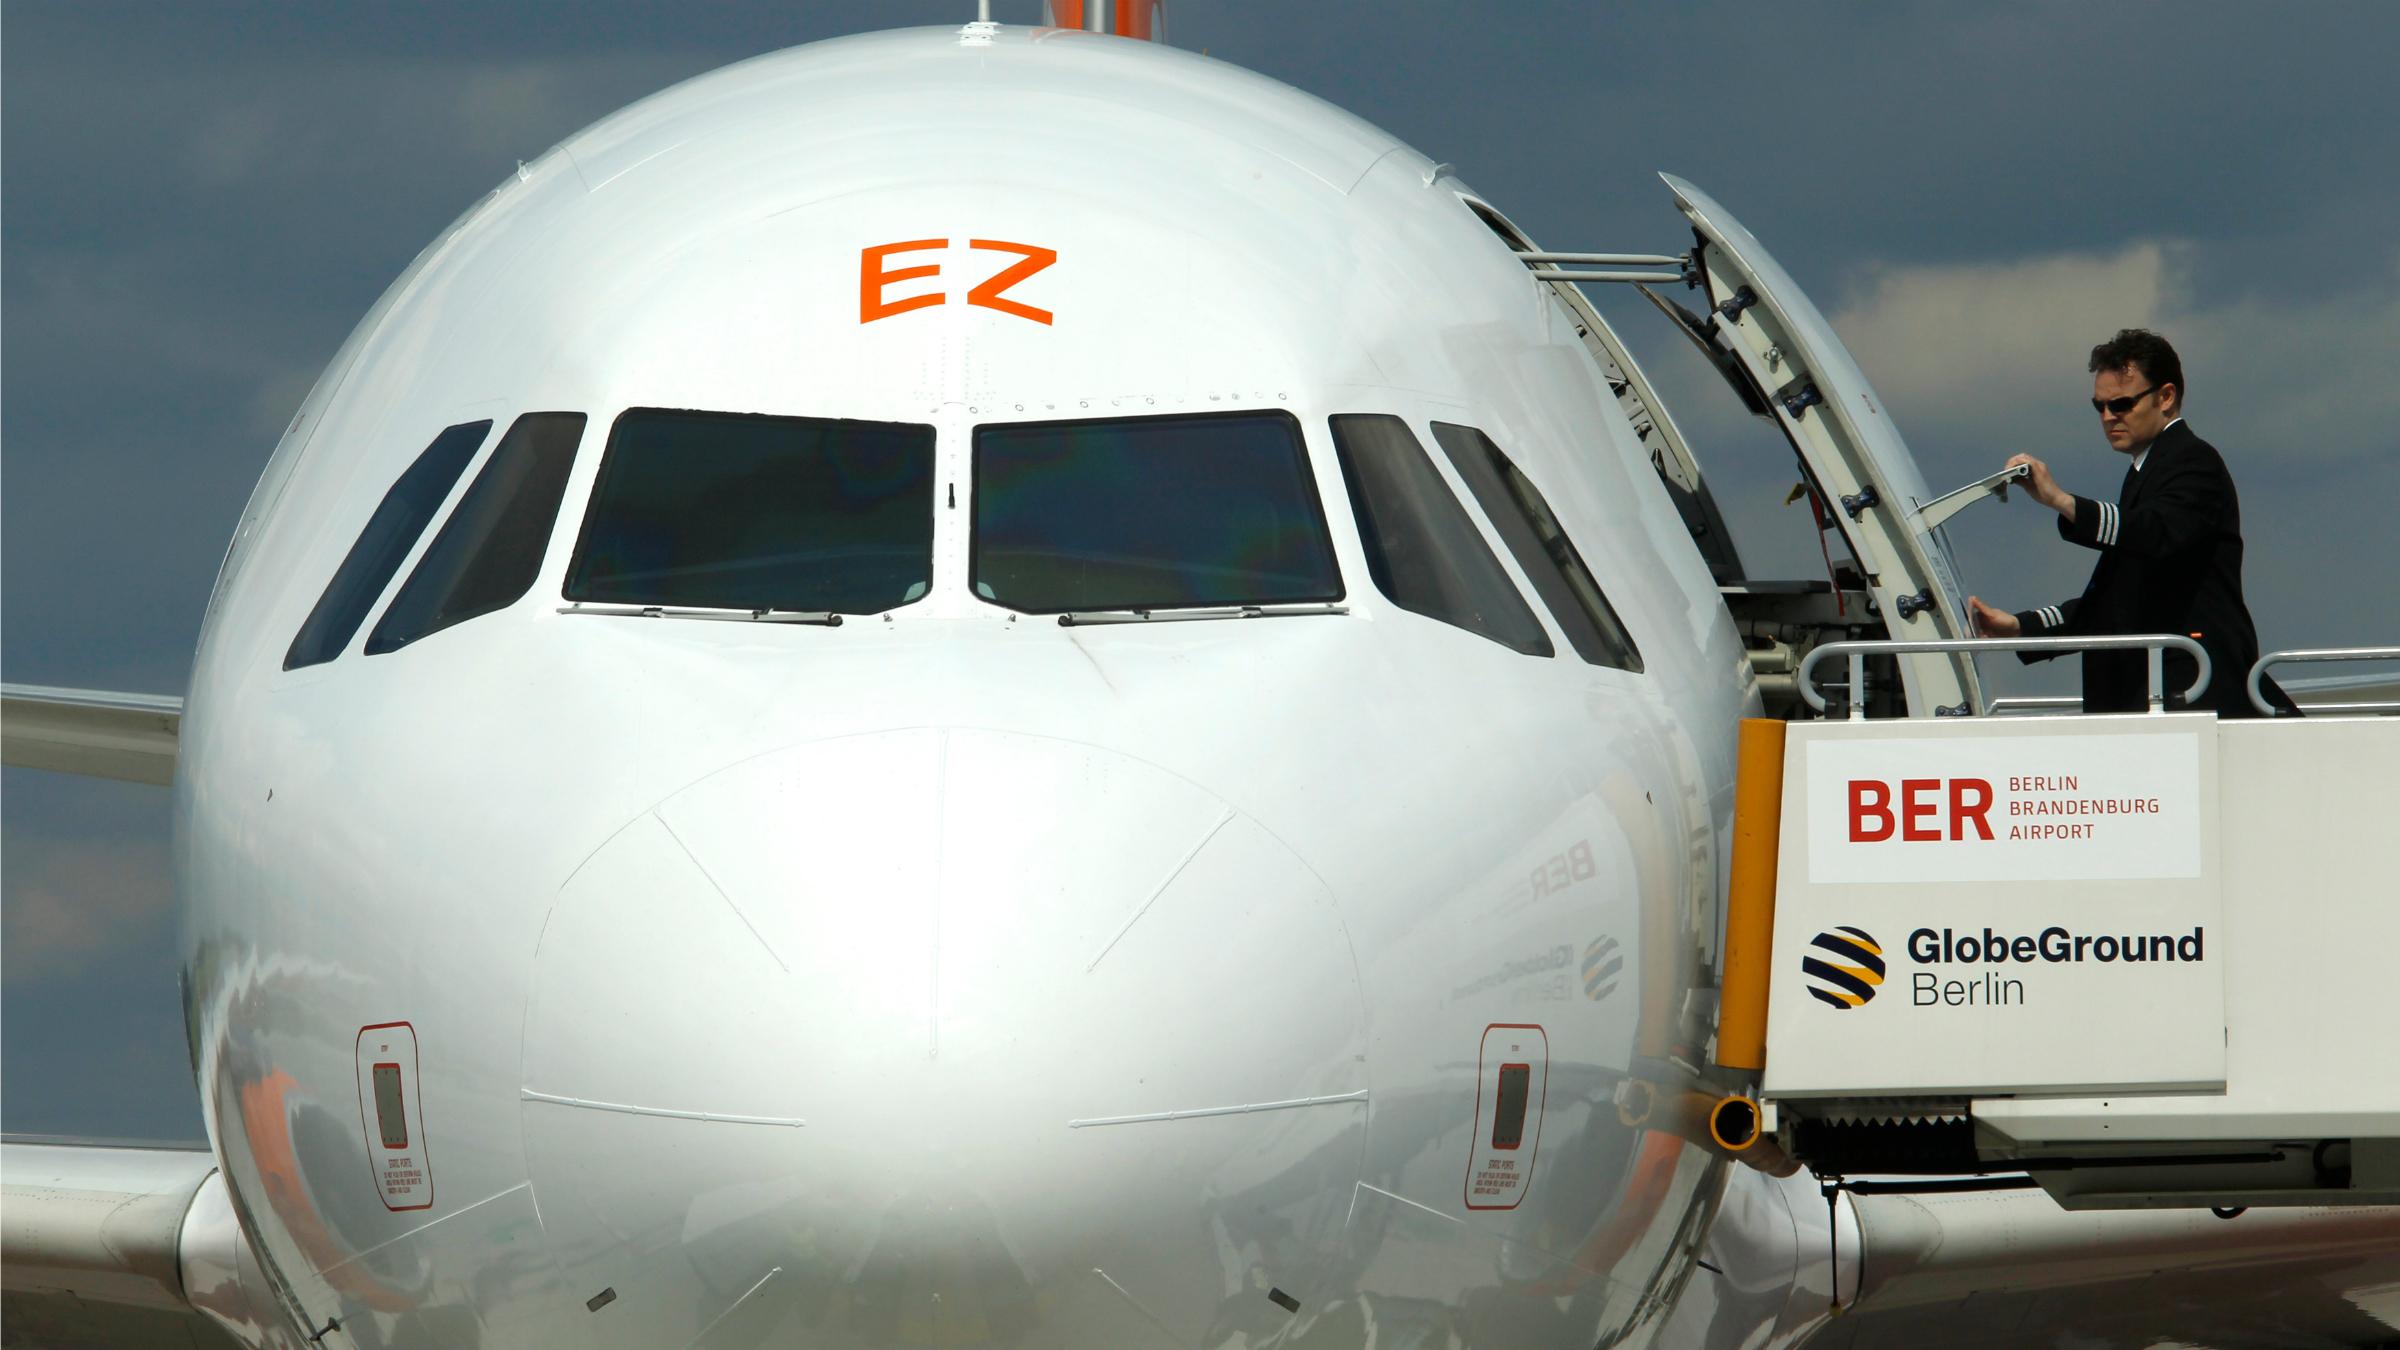 EasyJet budget airline